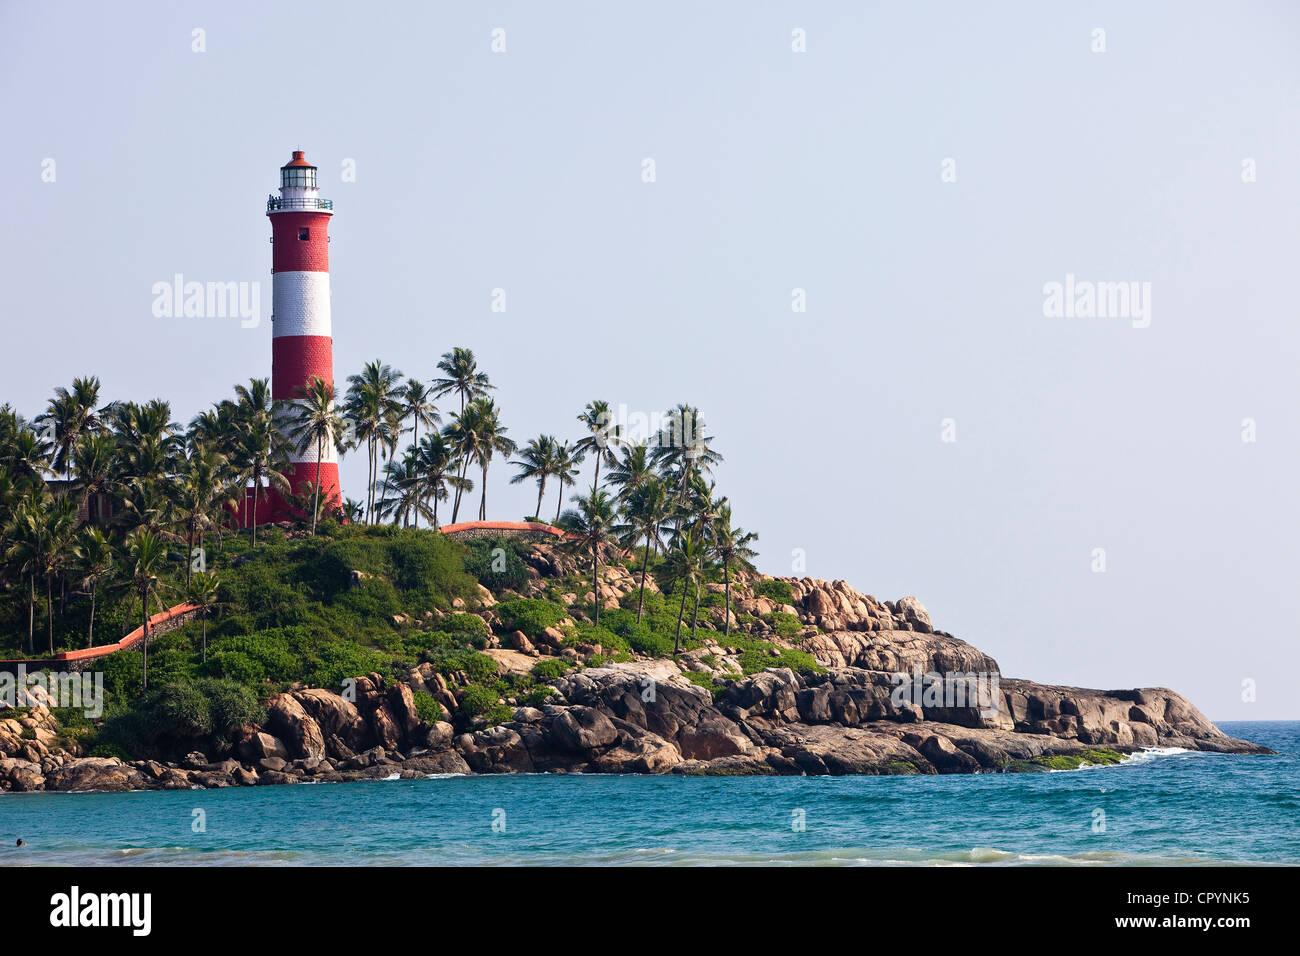 India, Kerala State, seaside resort of Kovalam, le phare - Stock Image